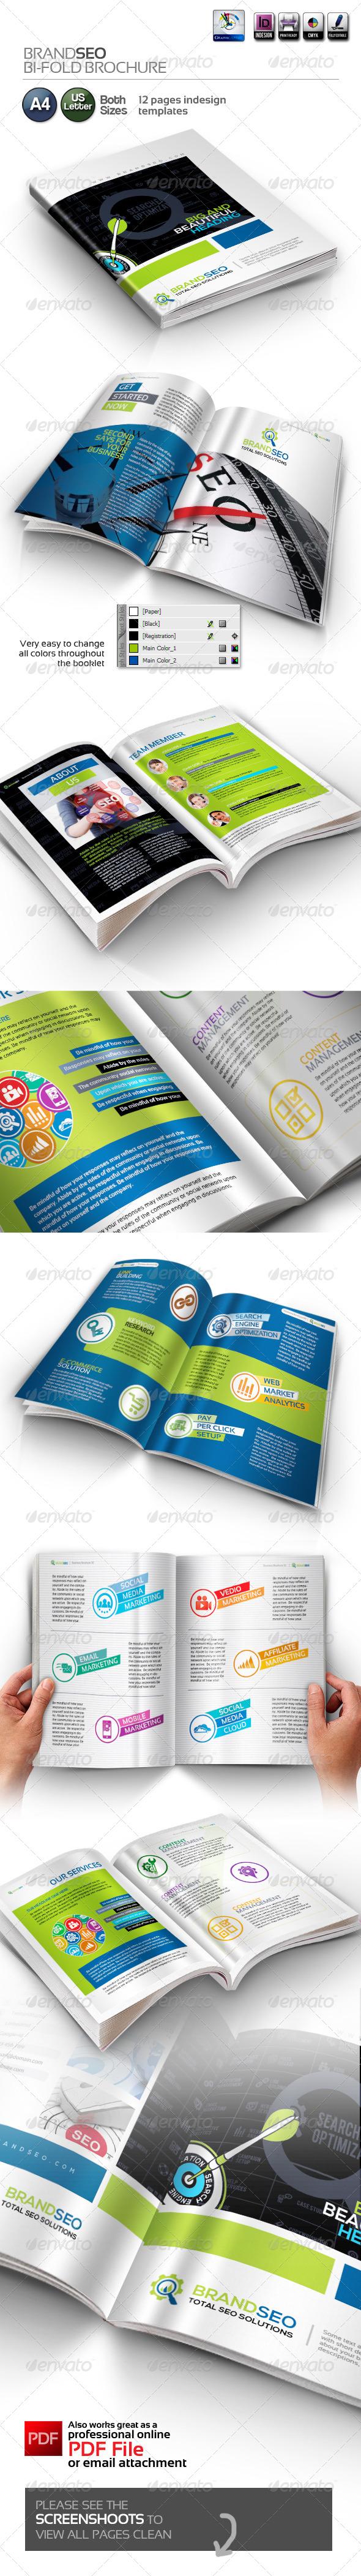 BrandSEO Bi-fold Creative Brochure